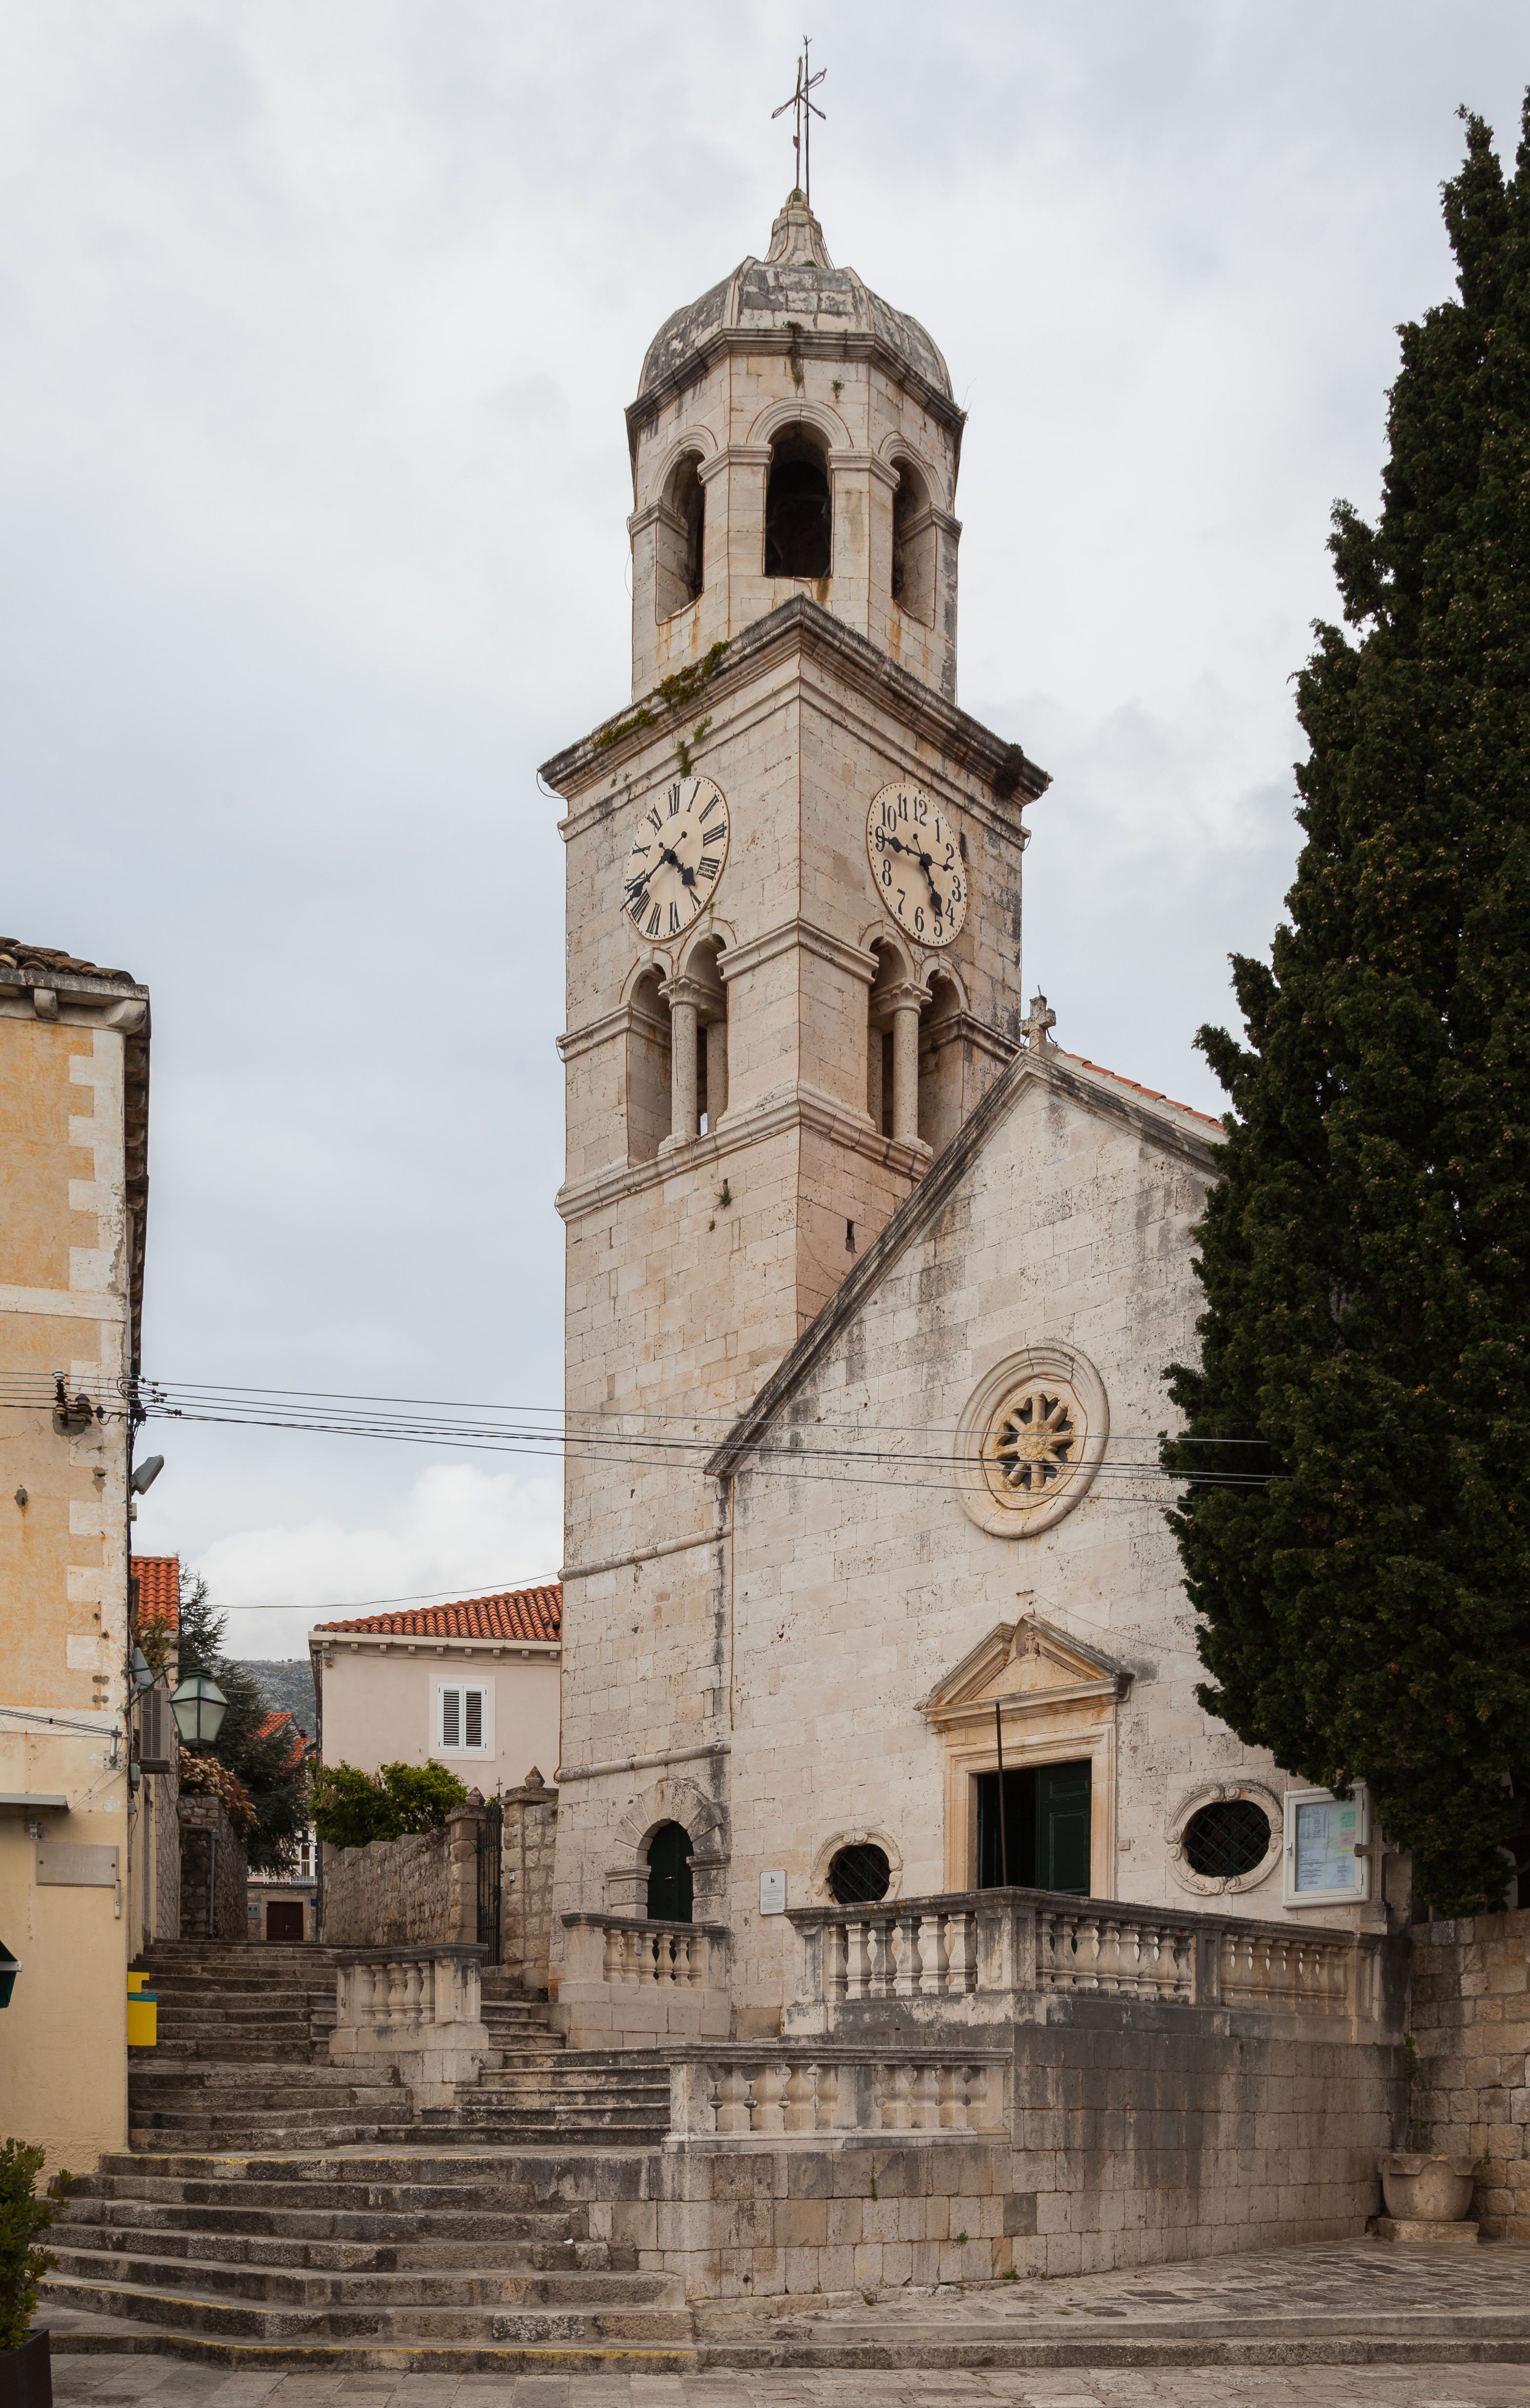 File:Iglesia de San Nicolás, Cavtat, Croacia, 2014-04-19, DD 03.JPG - Wikimed...